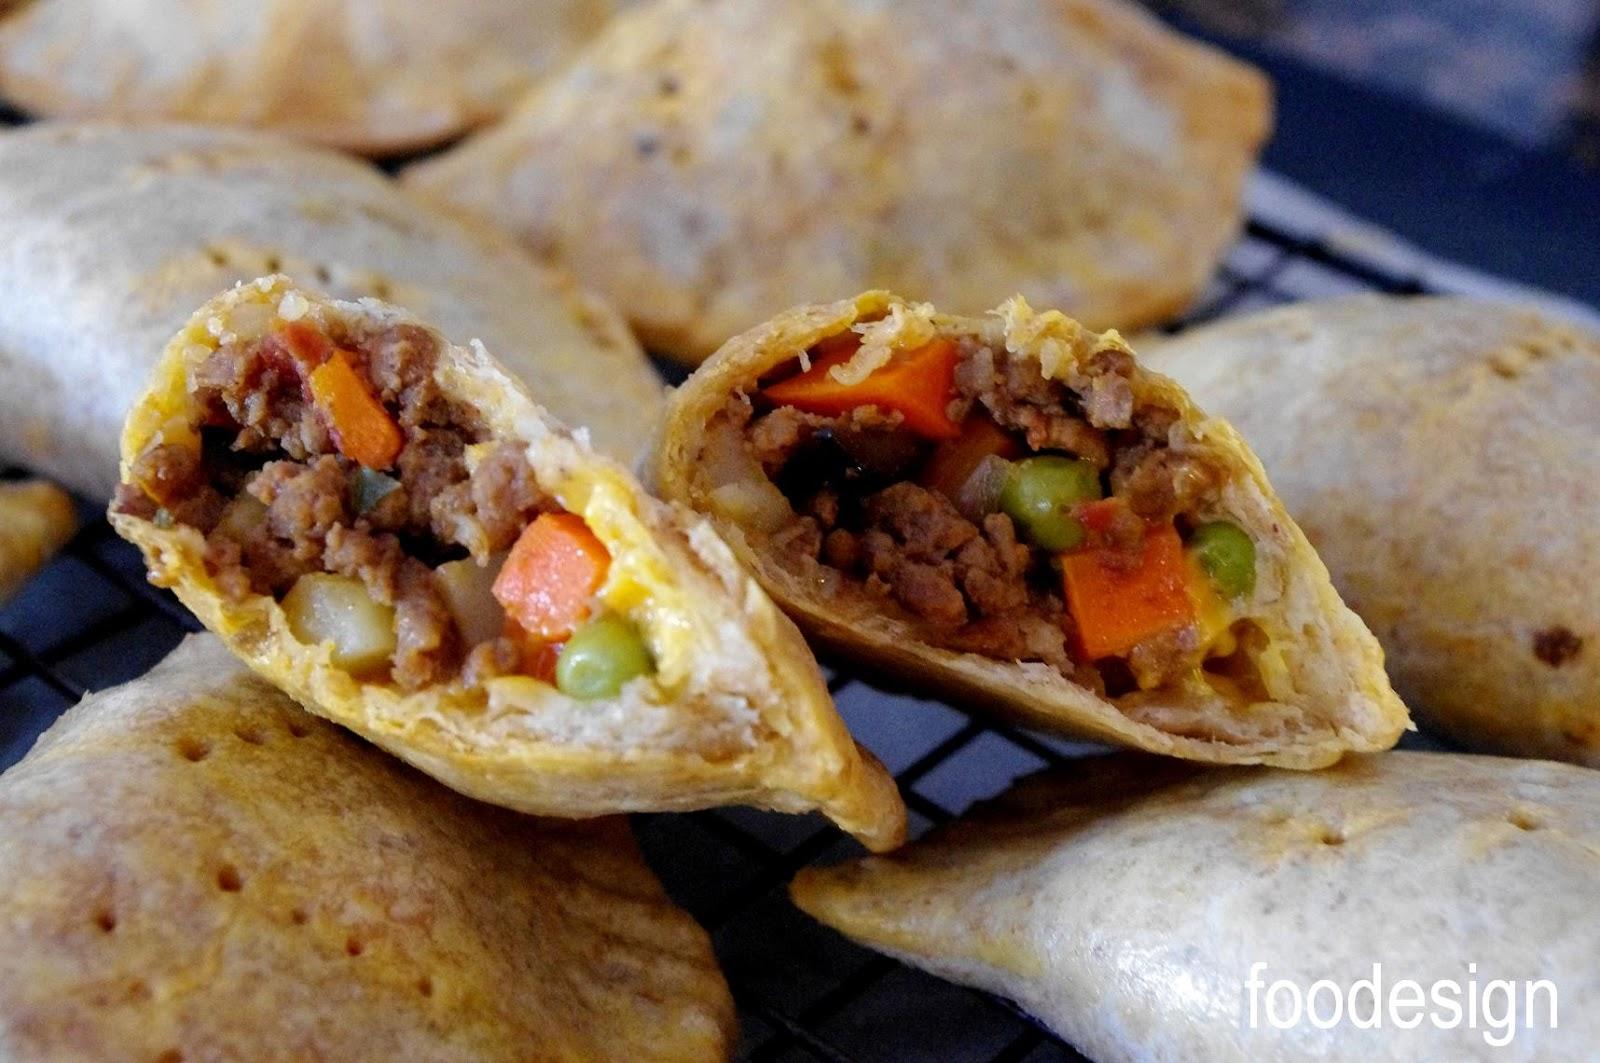 foodesign: empanadas with picadillo filling